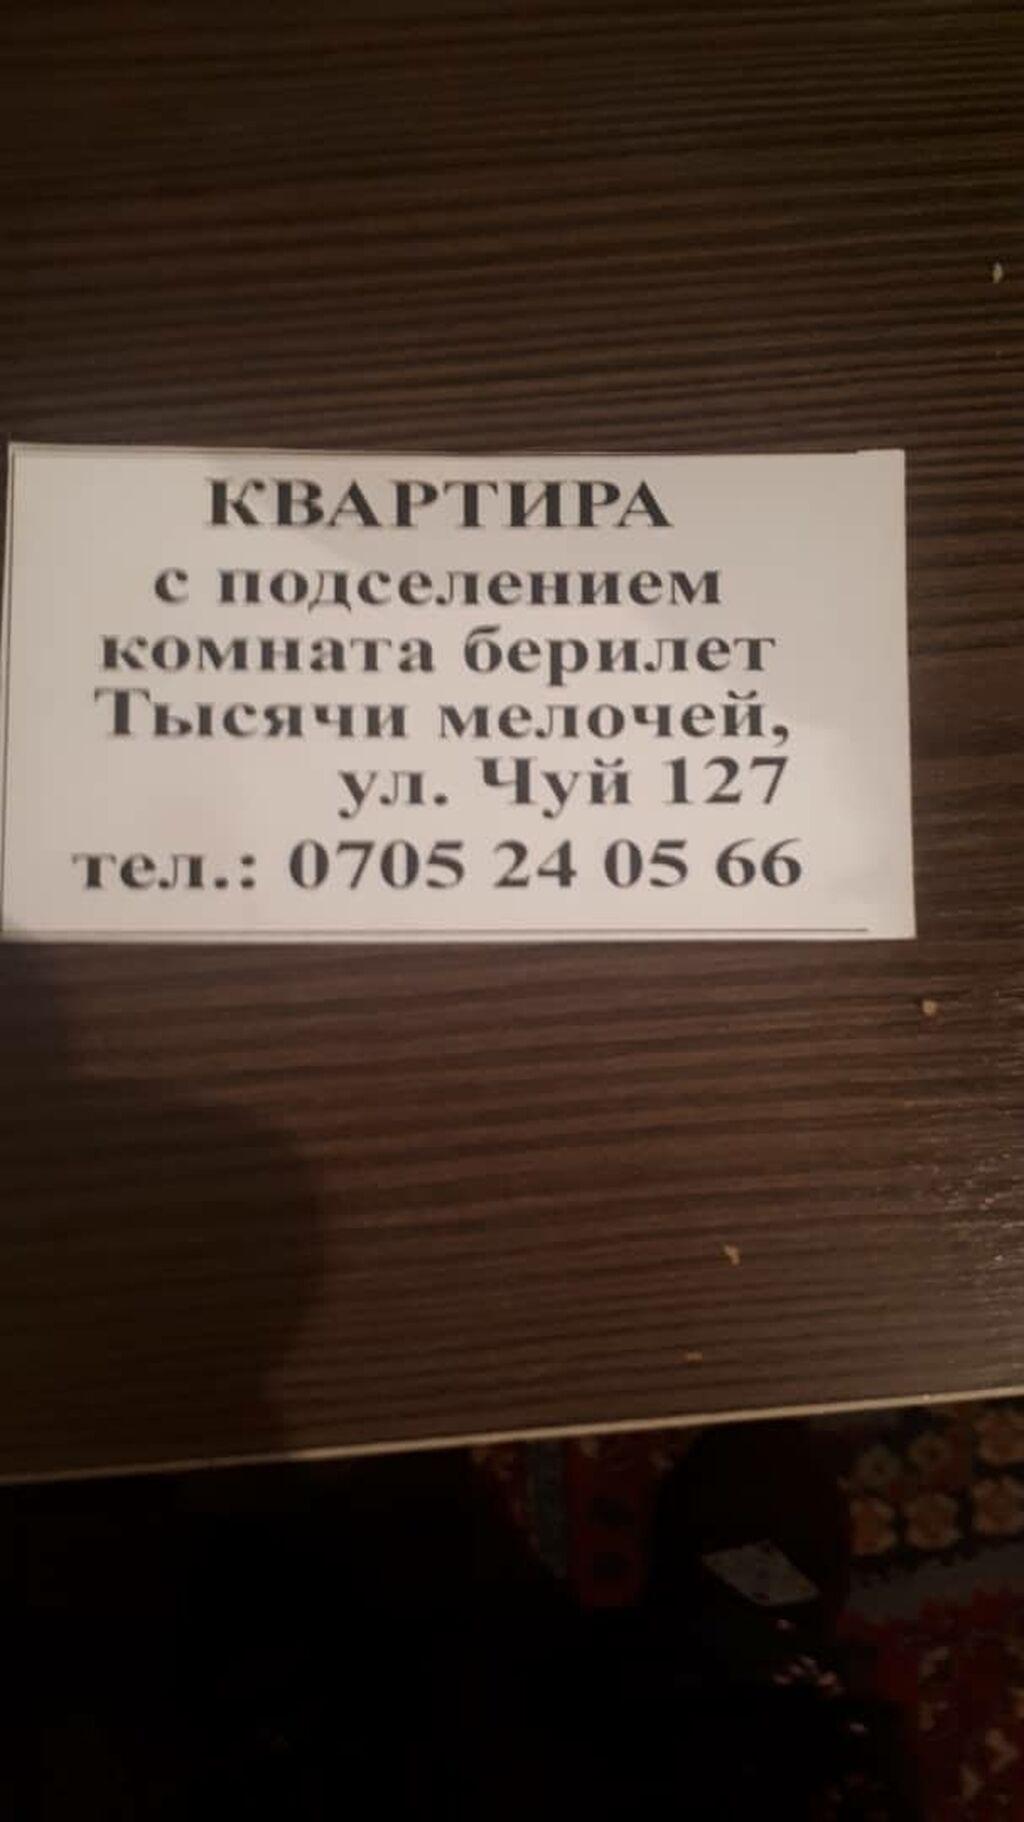 Сдается квартира: 3 комнаты, 50 кв. м, Бишкек: Сдается квартира: 3 комнаты, 50 кв. м, Бишкек